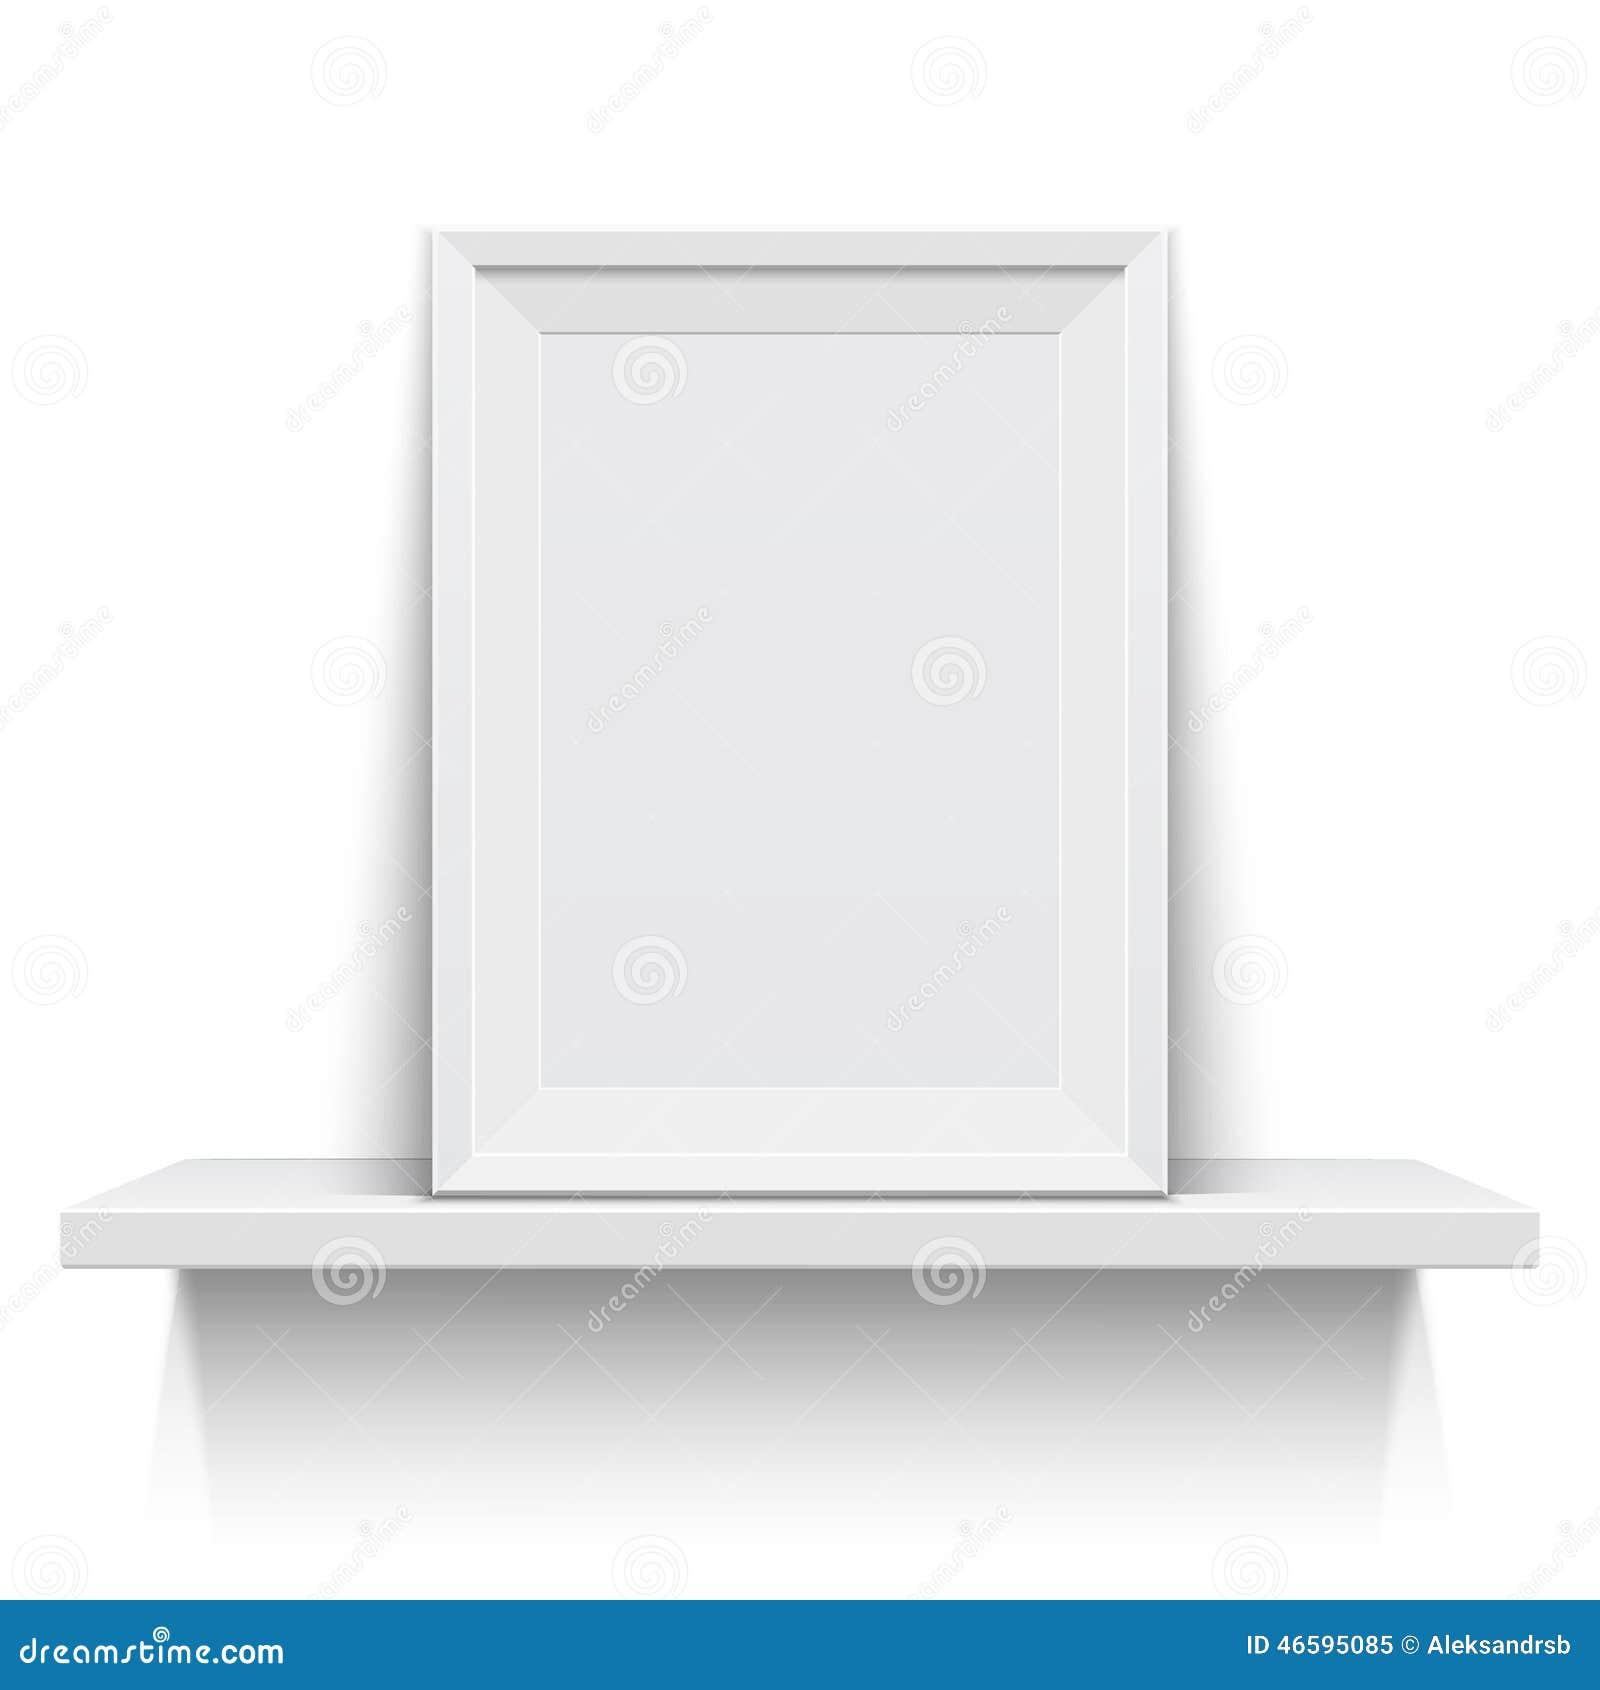 Realistic Picture Frame On White Shelf Stock Vector - Illustration ...